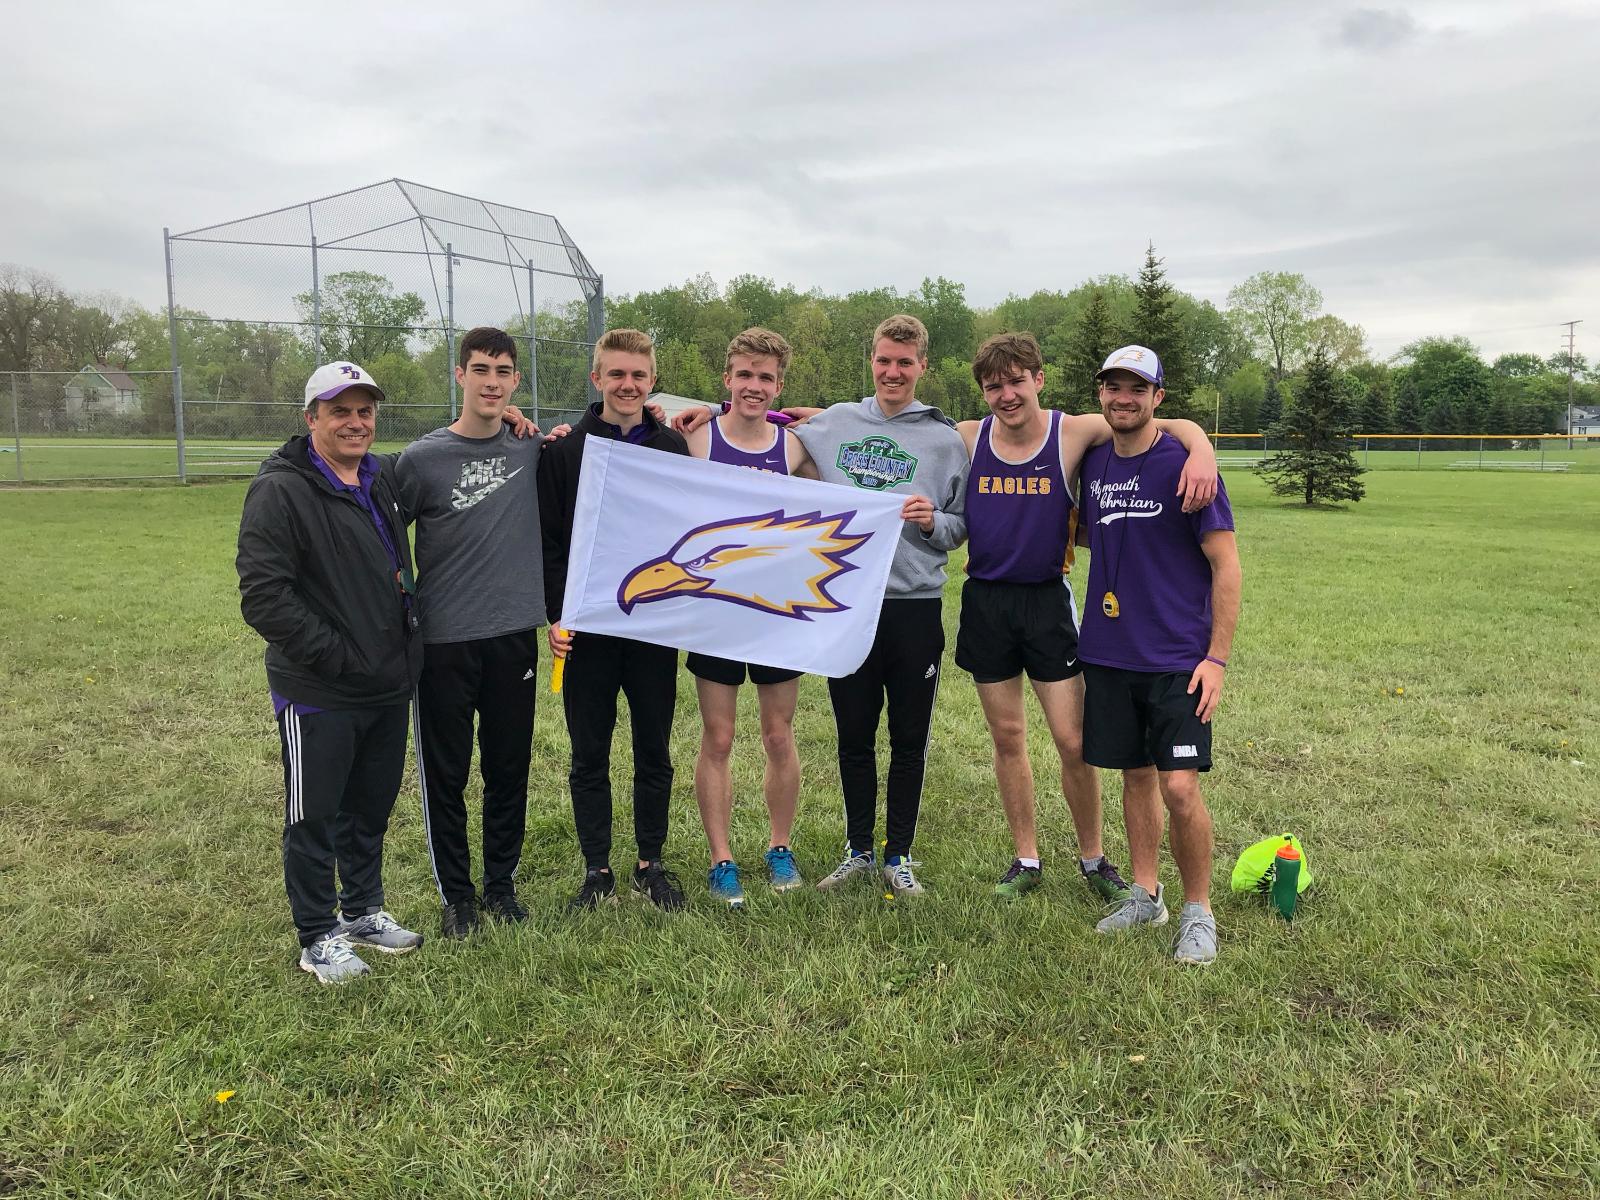 Eagles Soar at Regional Meet